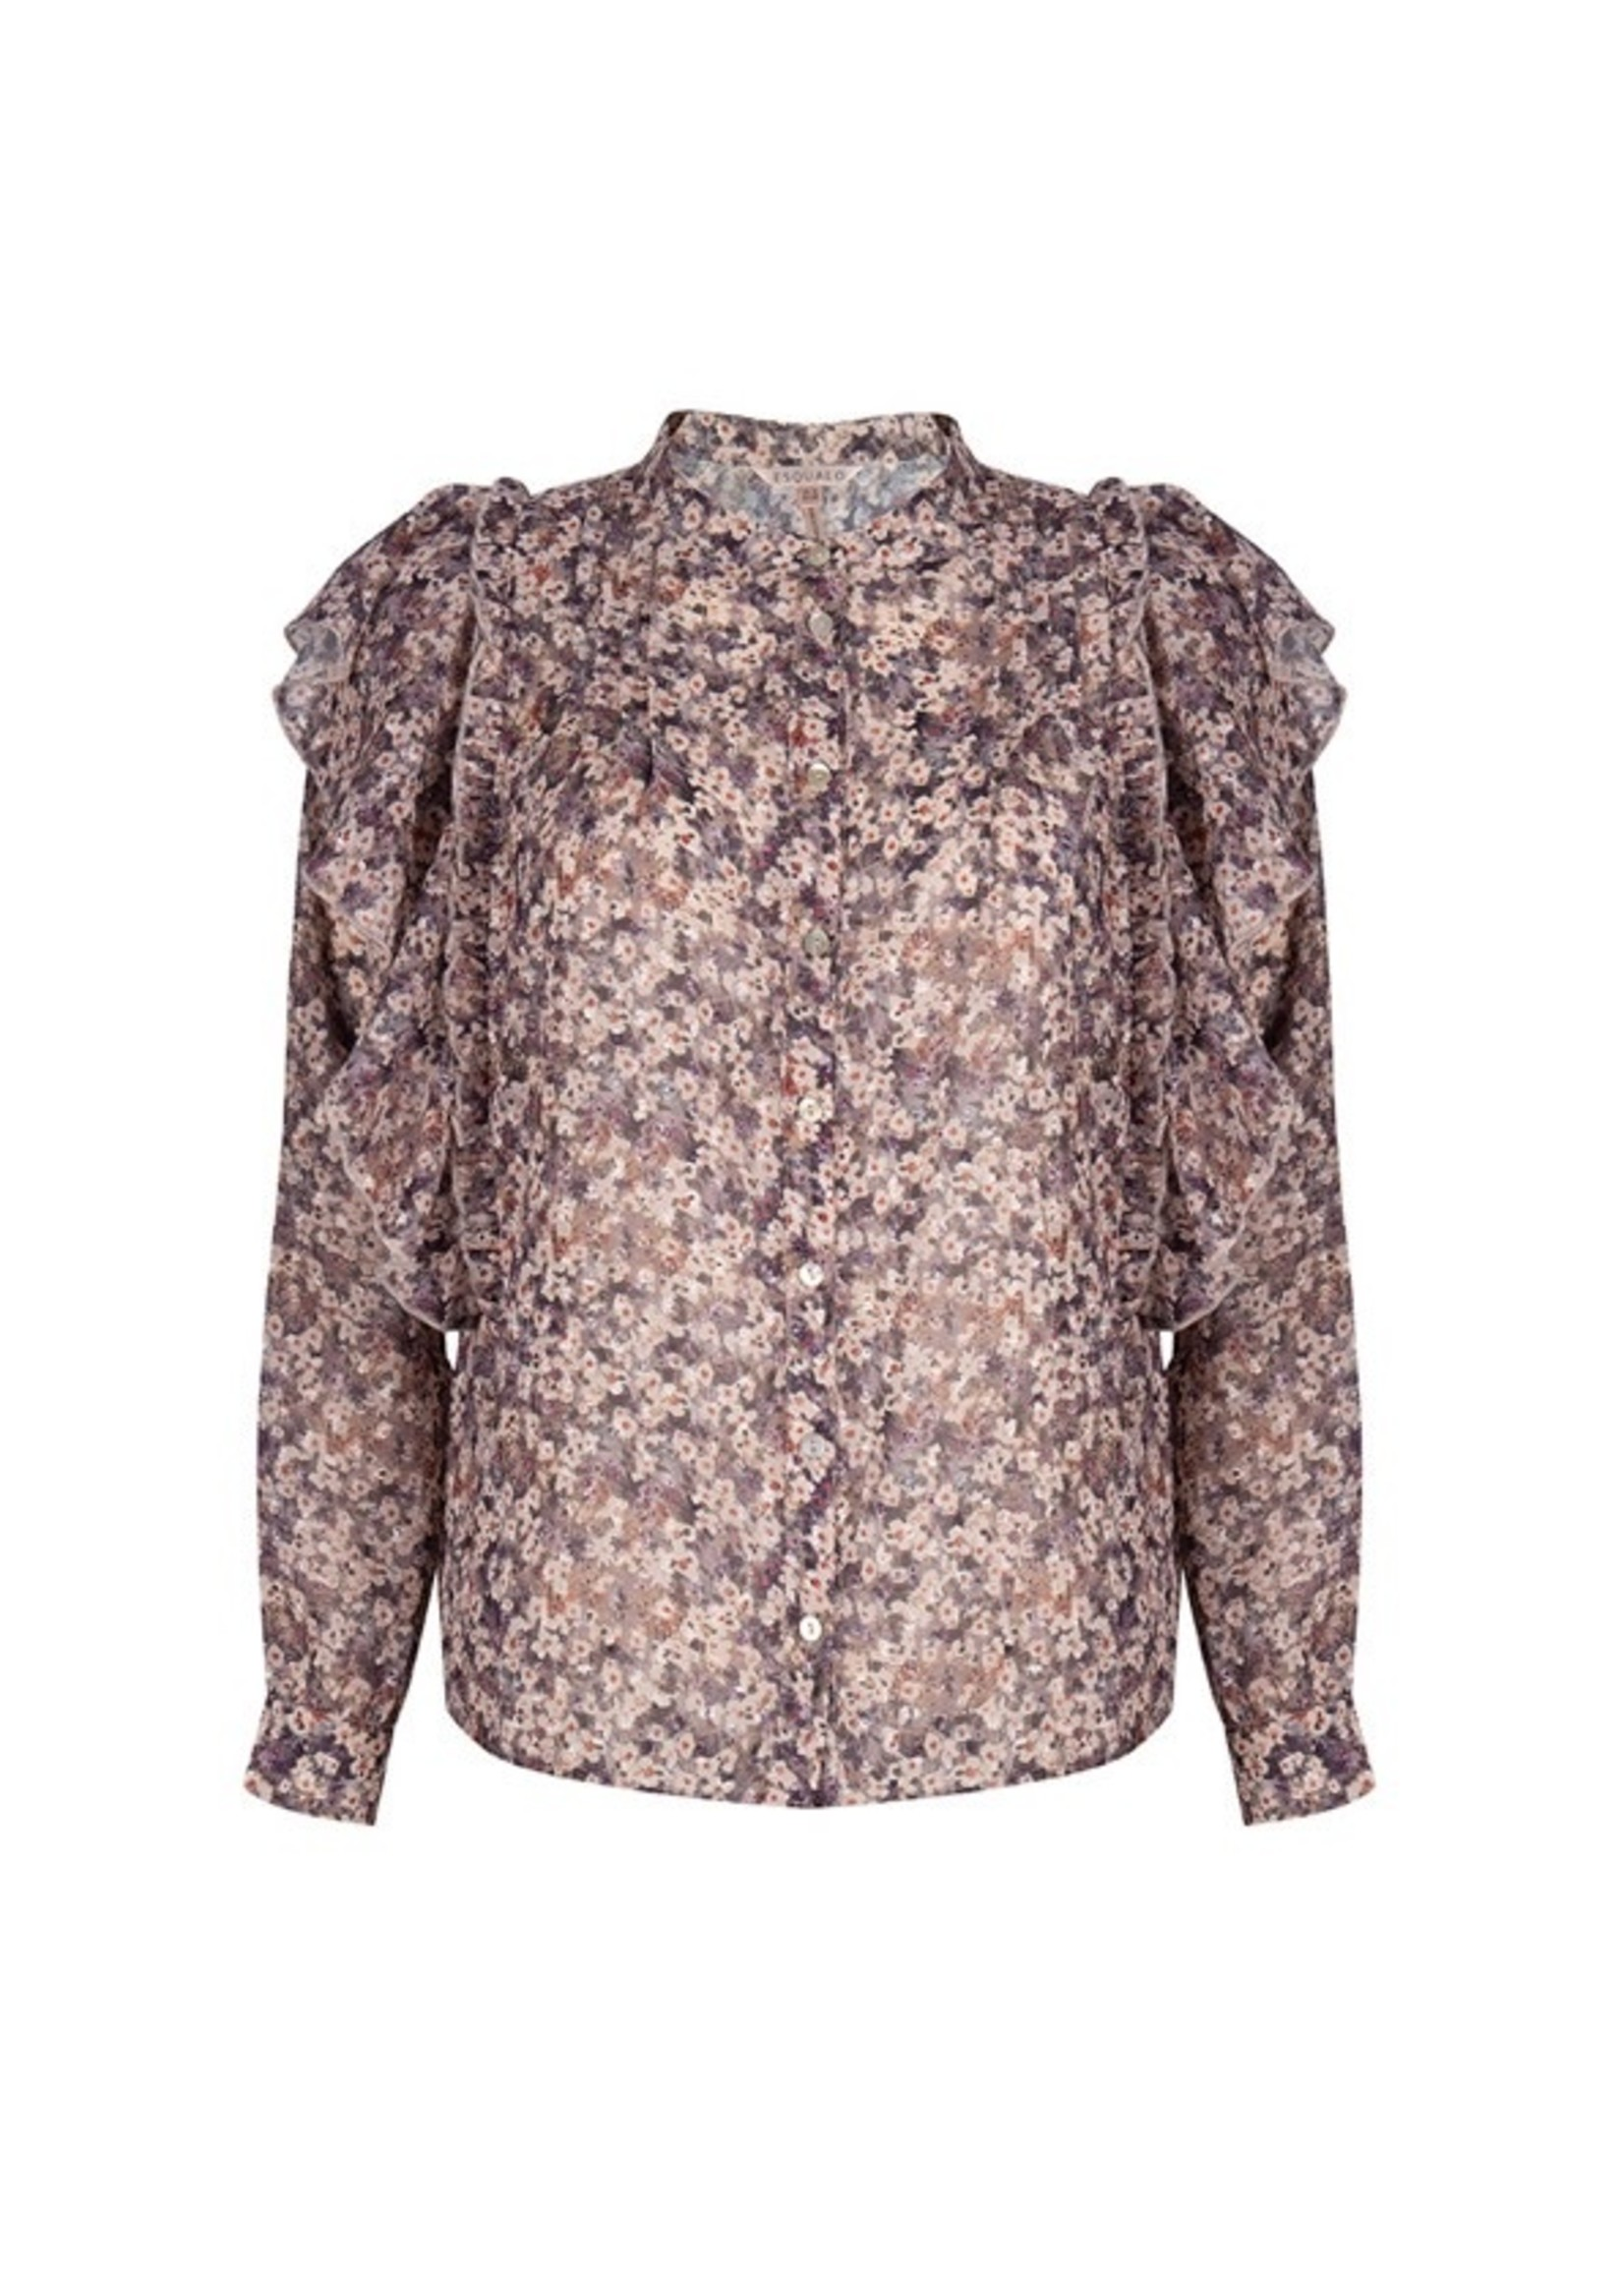 F21.15502 Blouse pintucks lilac floral Print